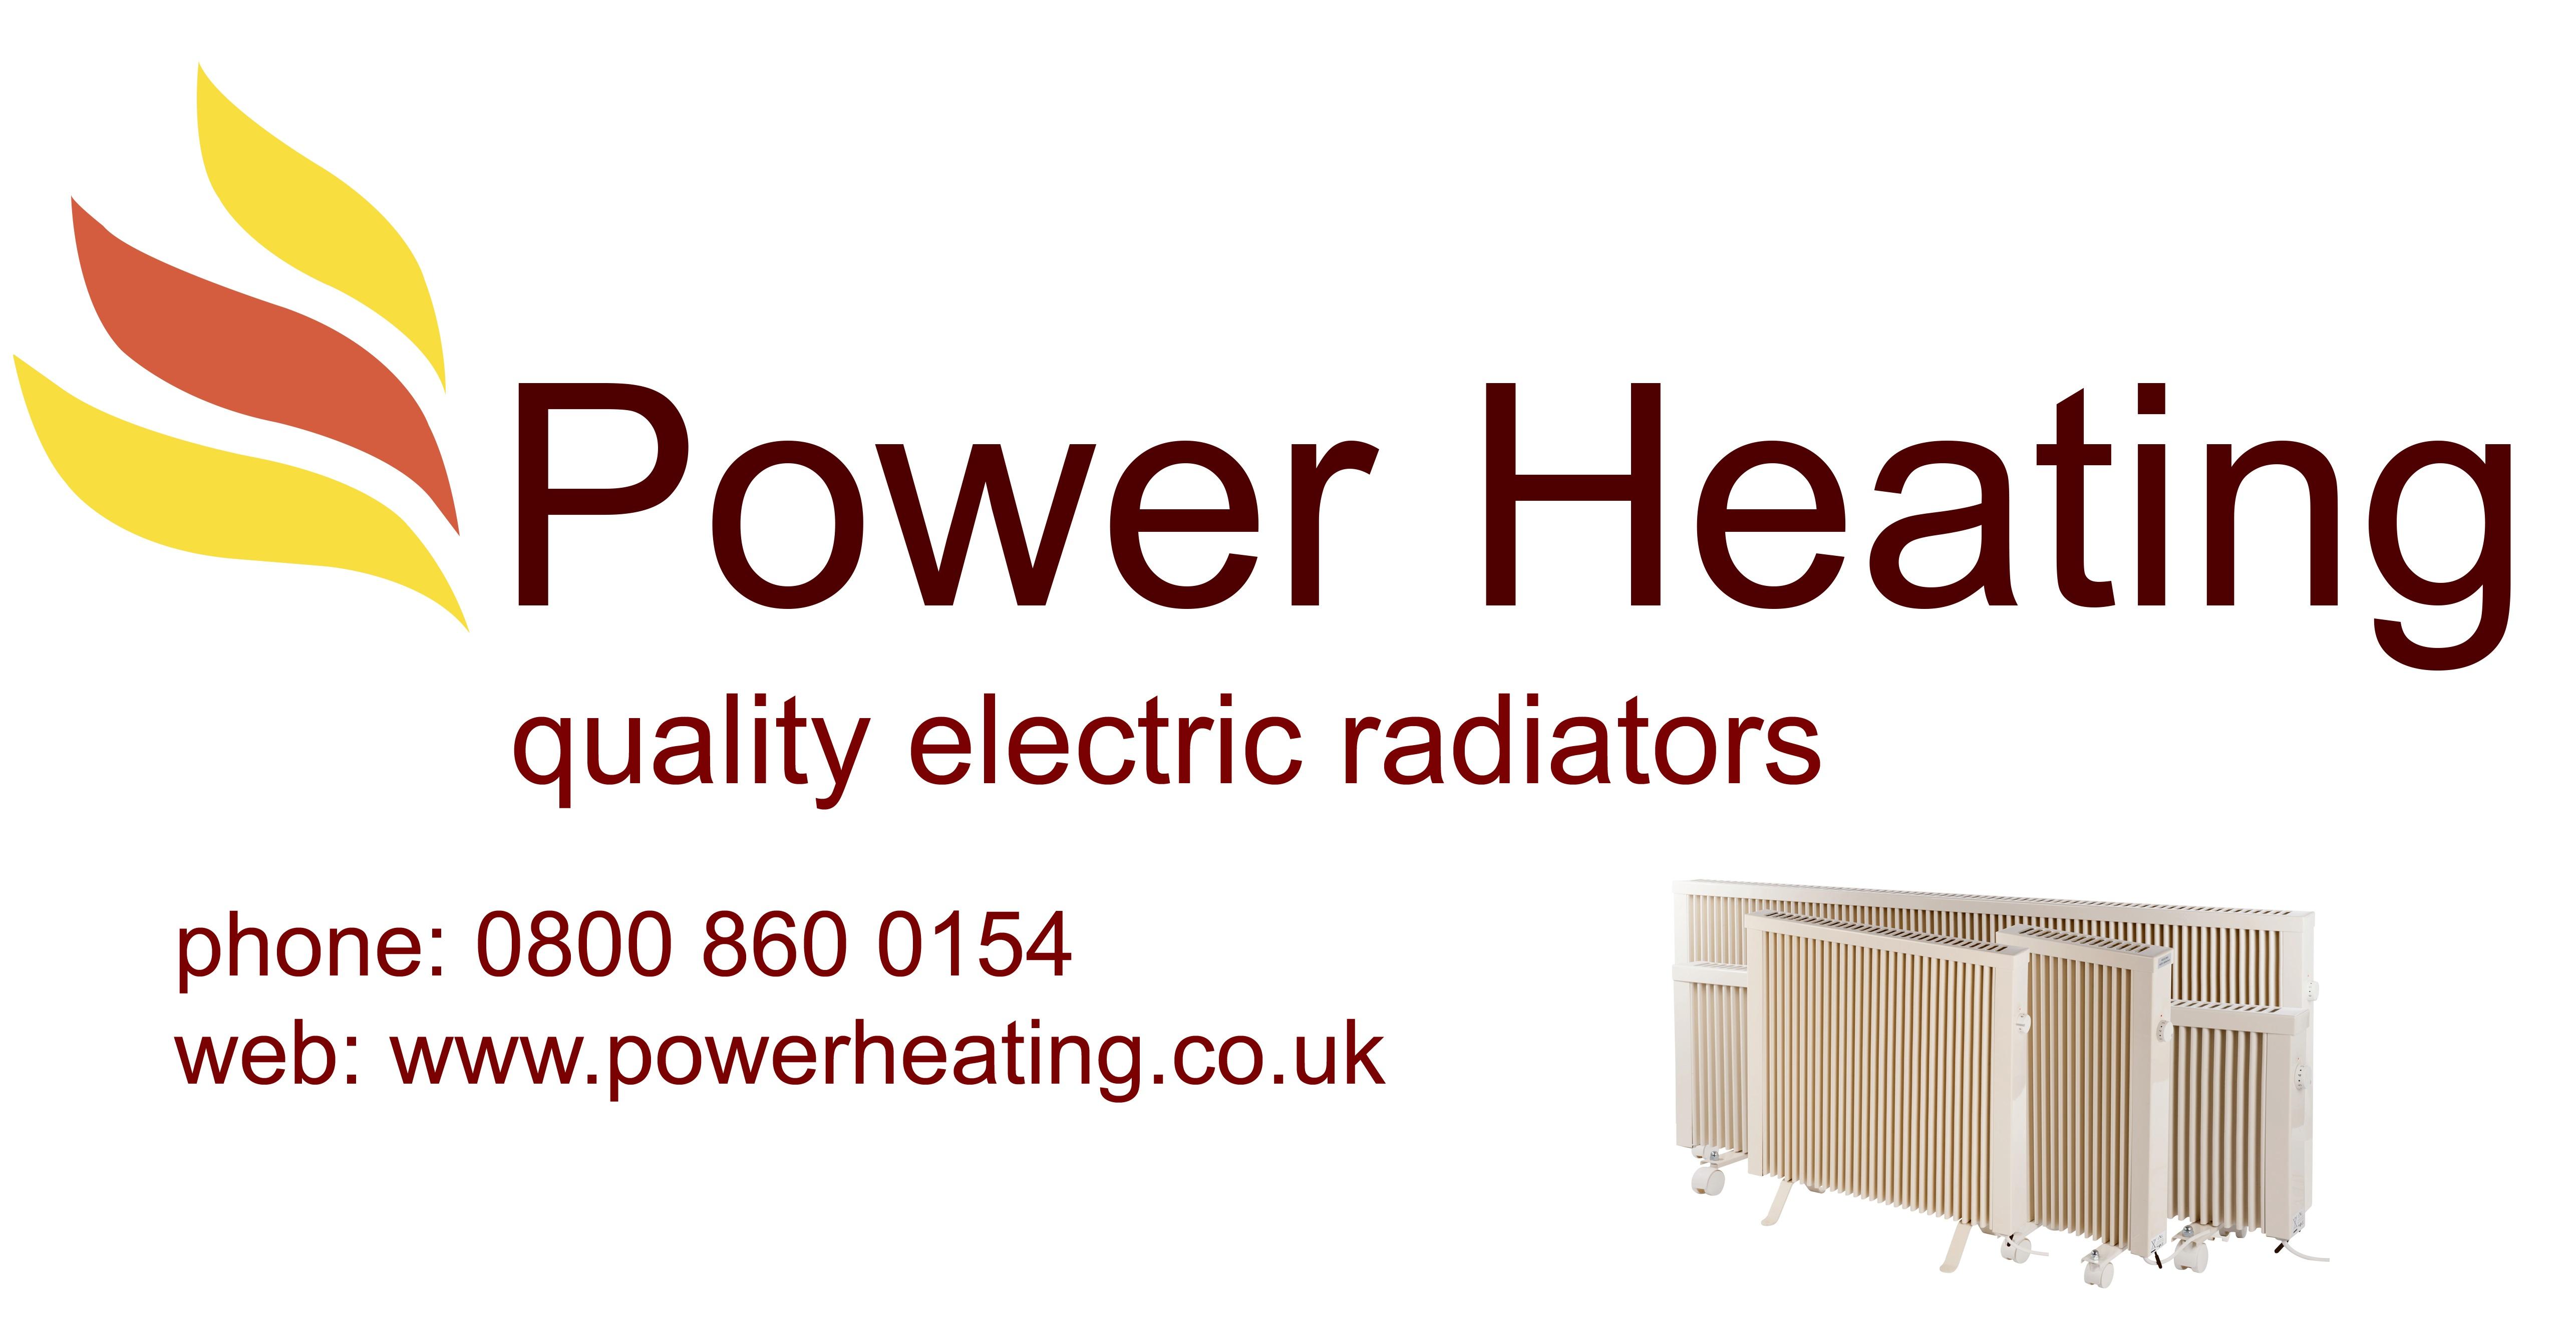 Power Heating